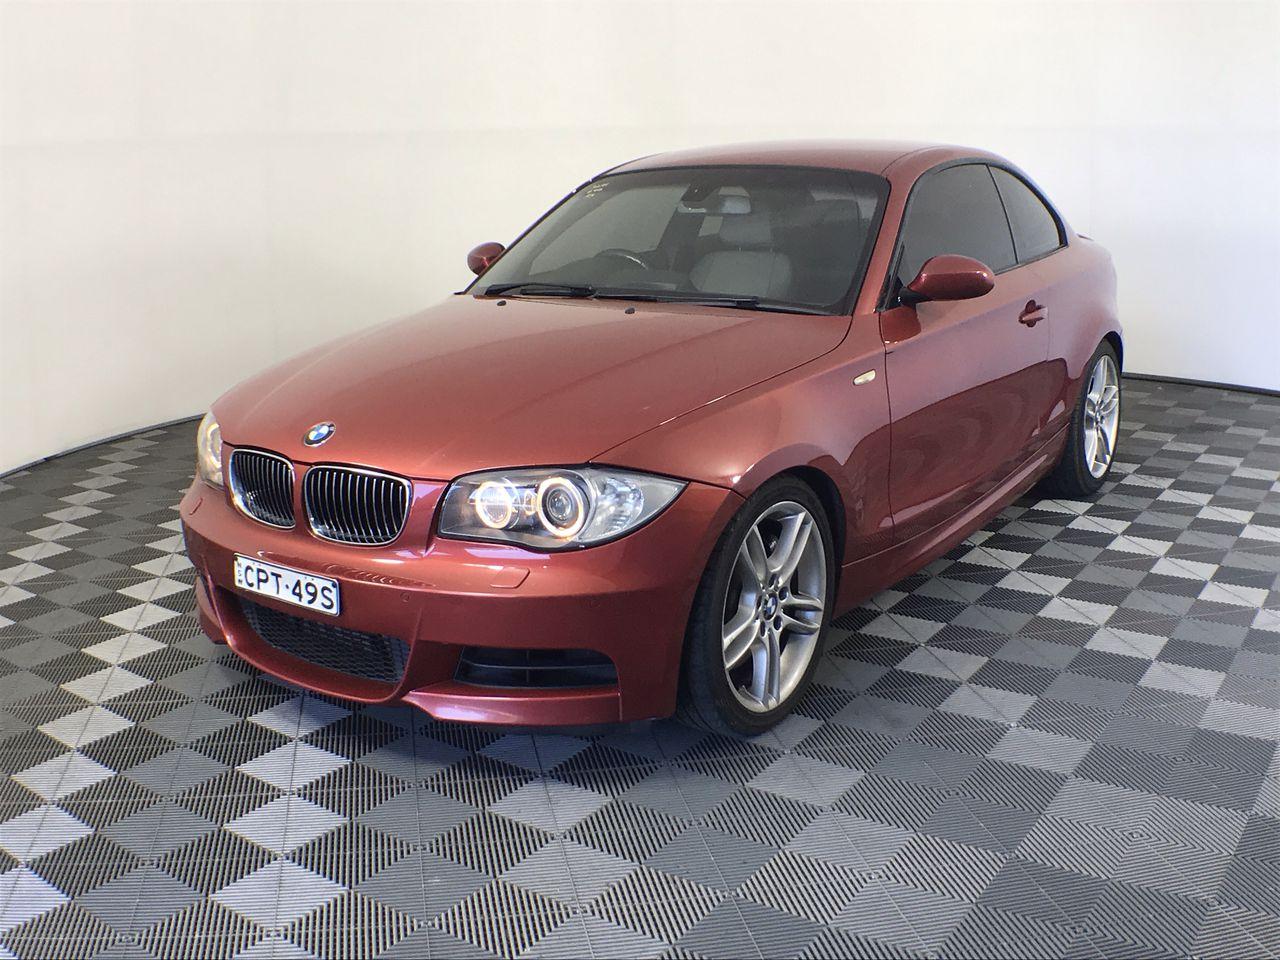 2008 BMW 1 35i SPORT E82 Automatic Coupe